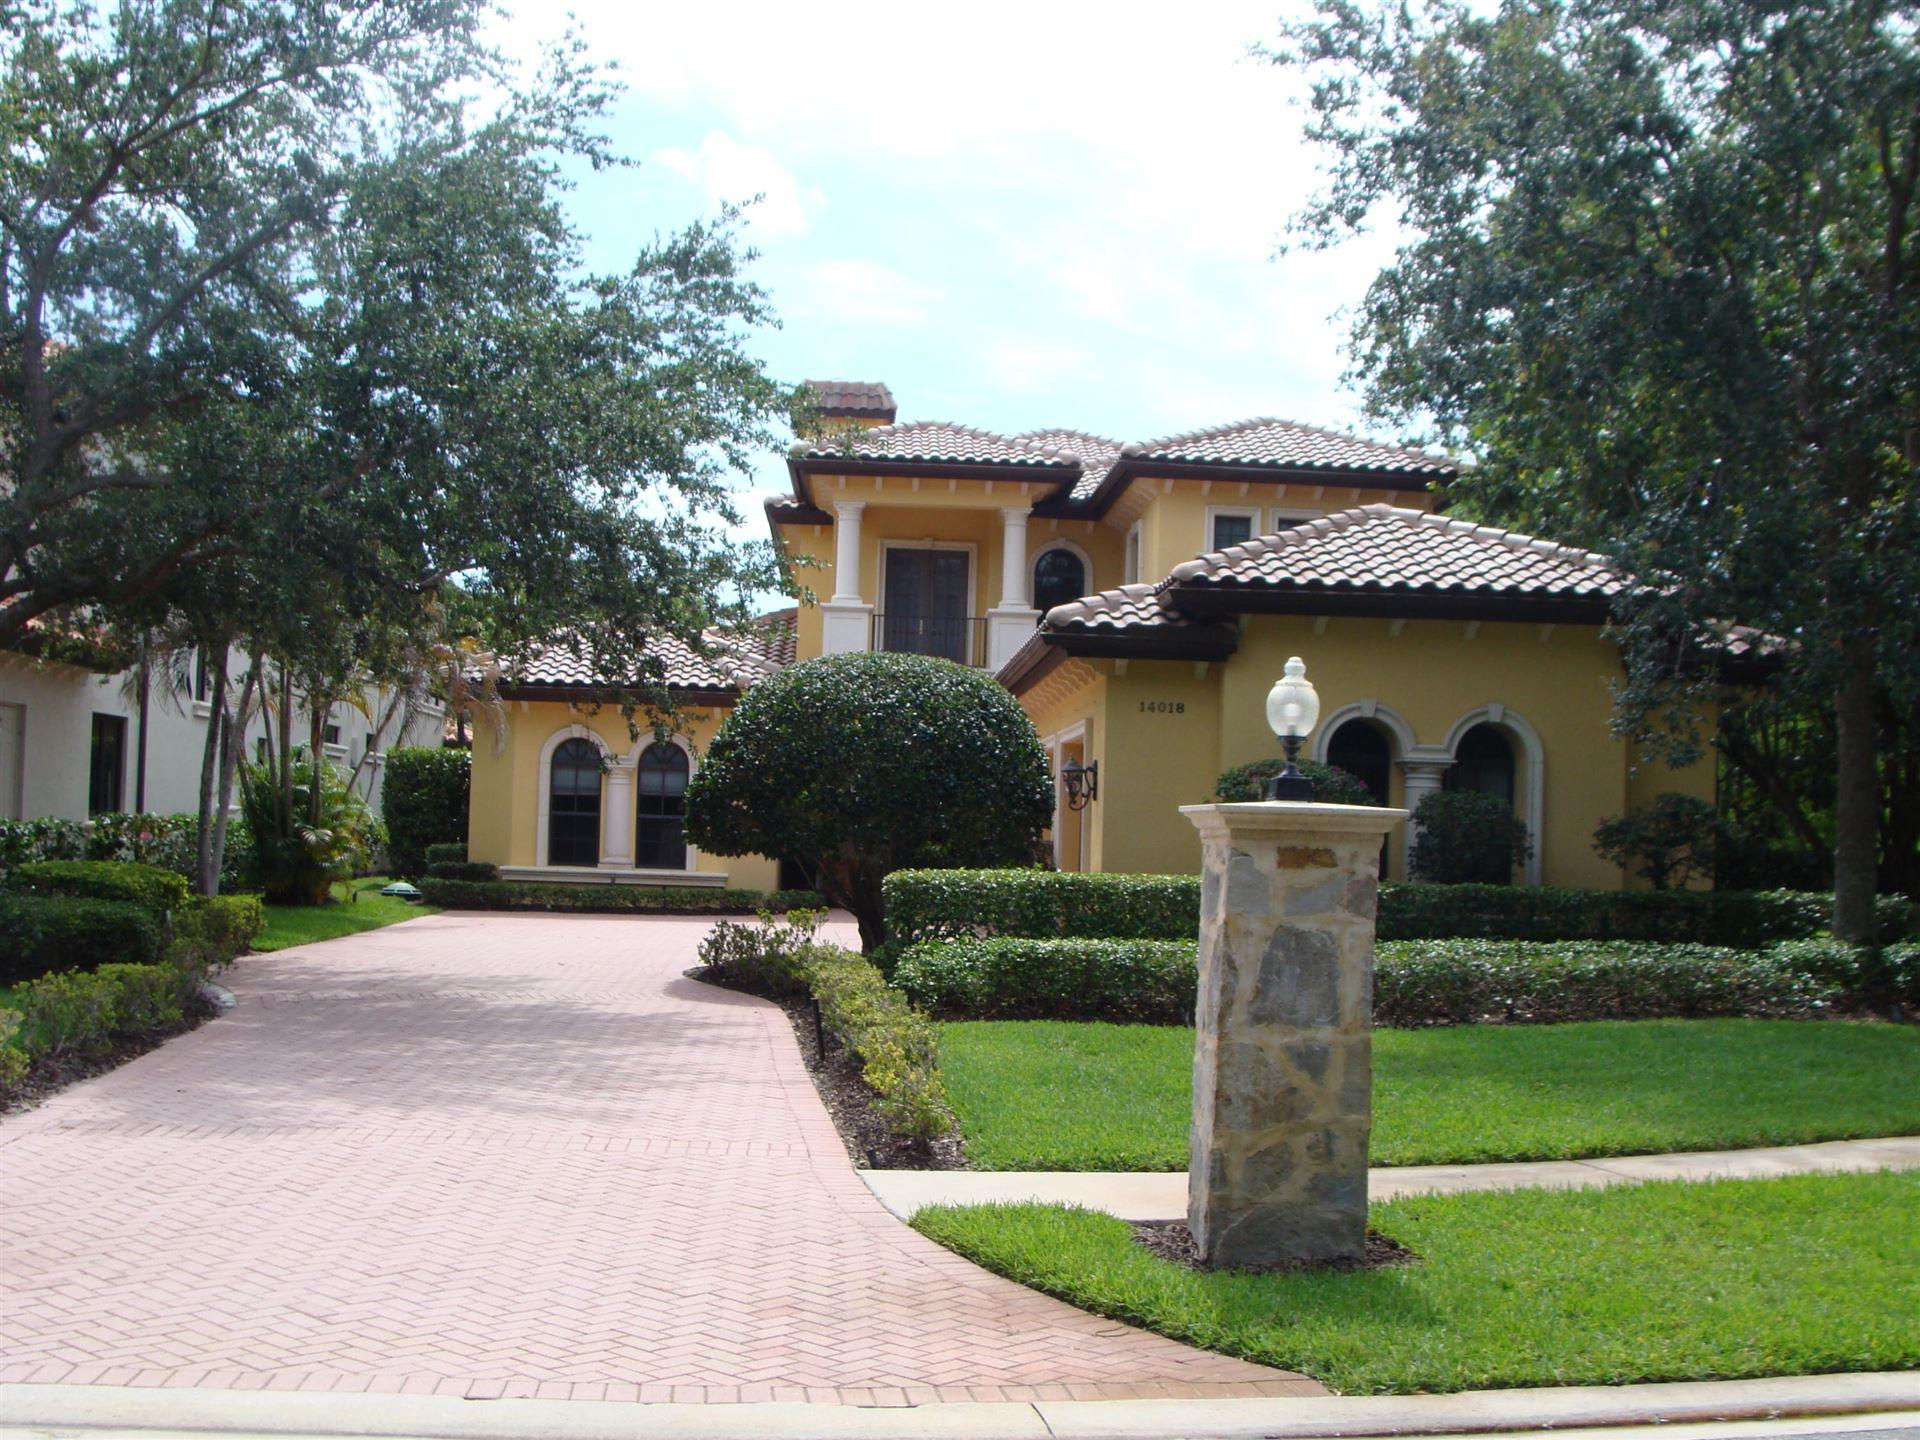 14018 Old Cypress Bend, Palm Beach Gardens, FL 33410 - MLS#: RX-10717457